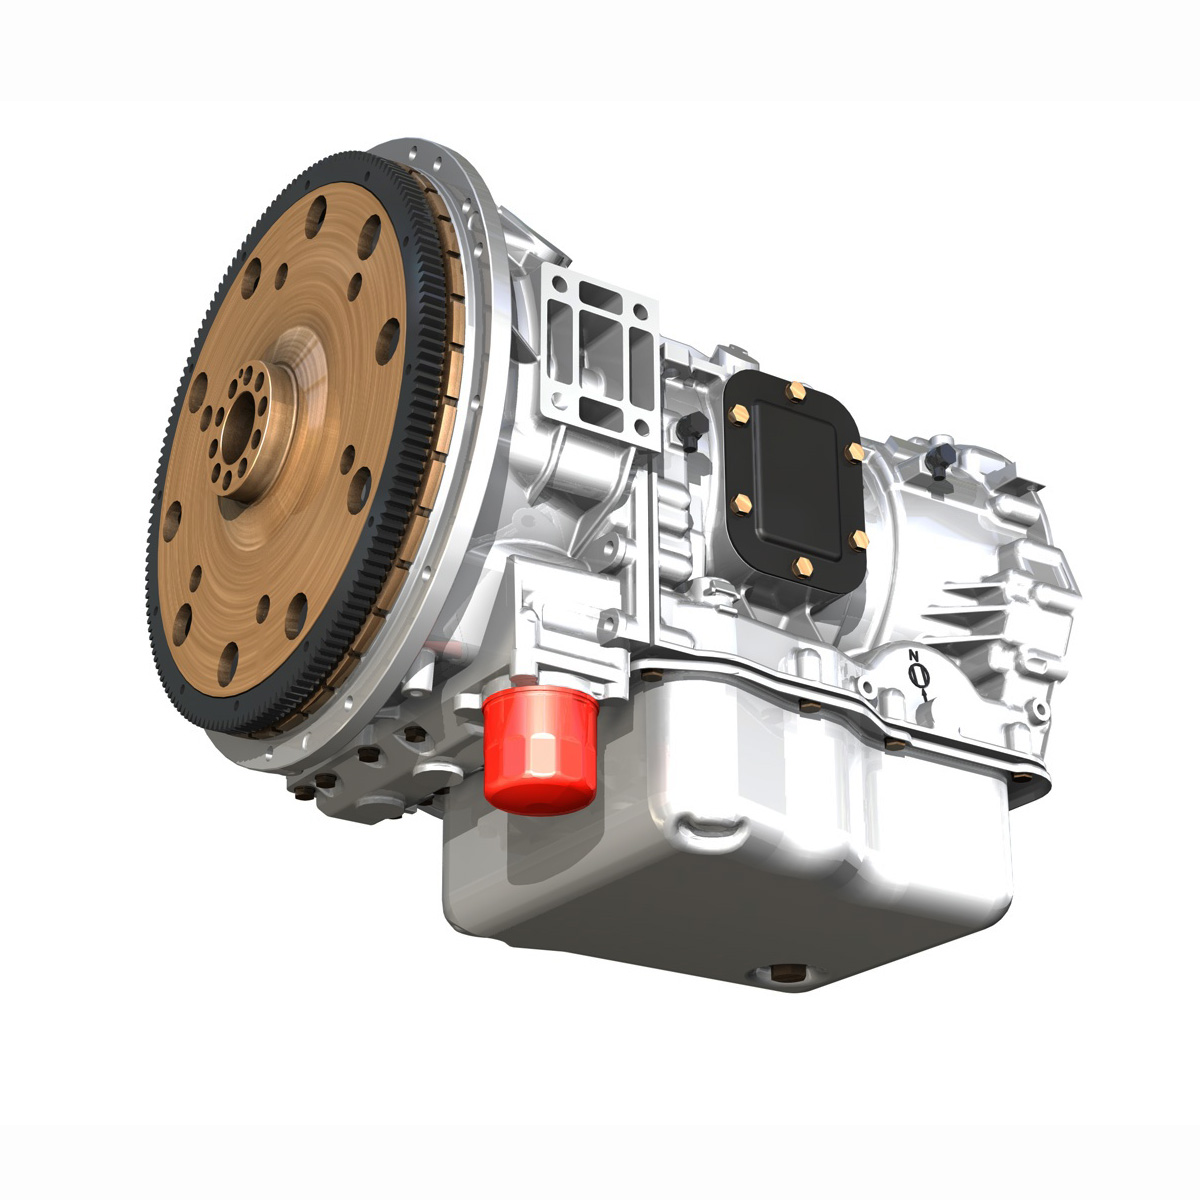 gearing – transmission 3d model 3ds fbx c4d lwo obj 189234